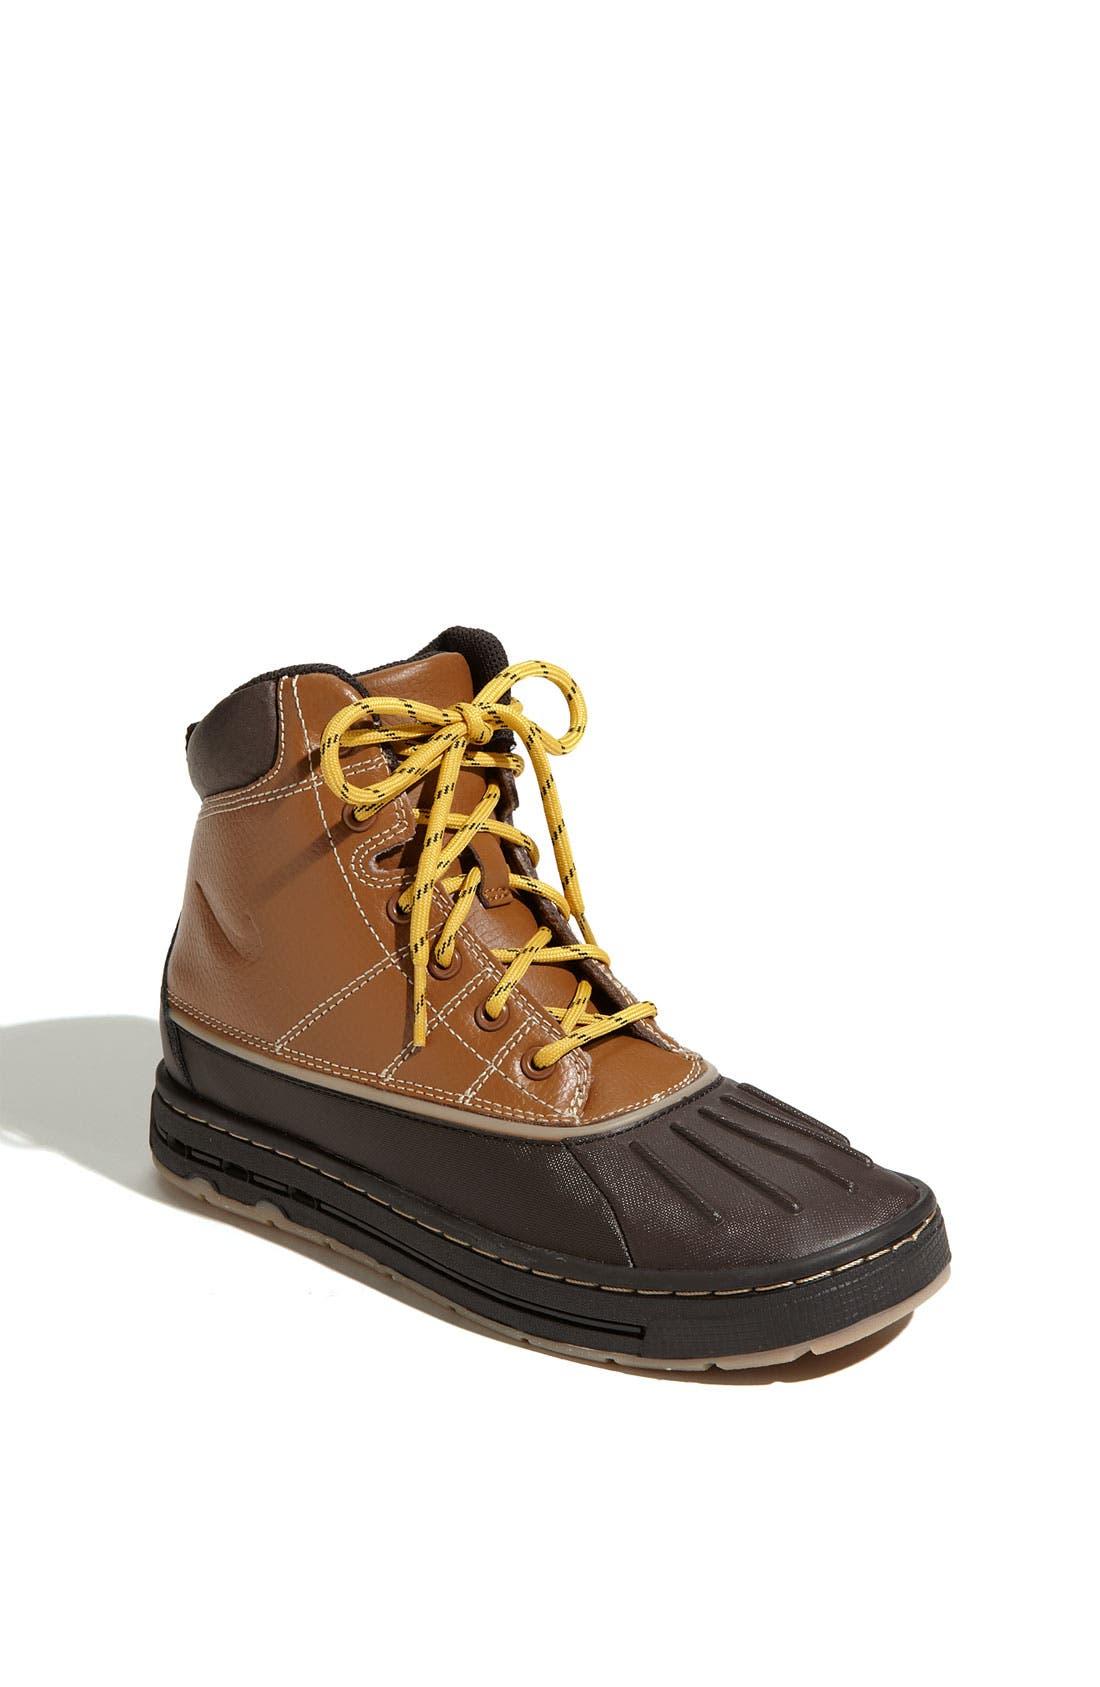 Alternate Image 1 Selected - Nike 'Woodside' Hiking Boot (Toddler, Little Kid & Big Kid)